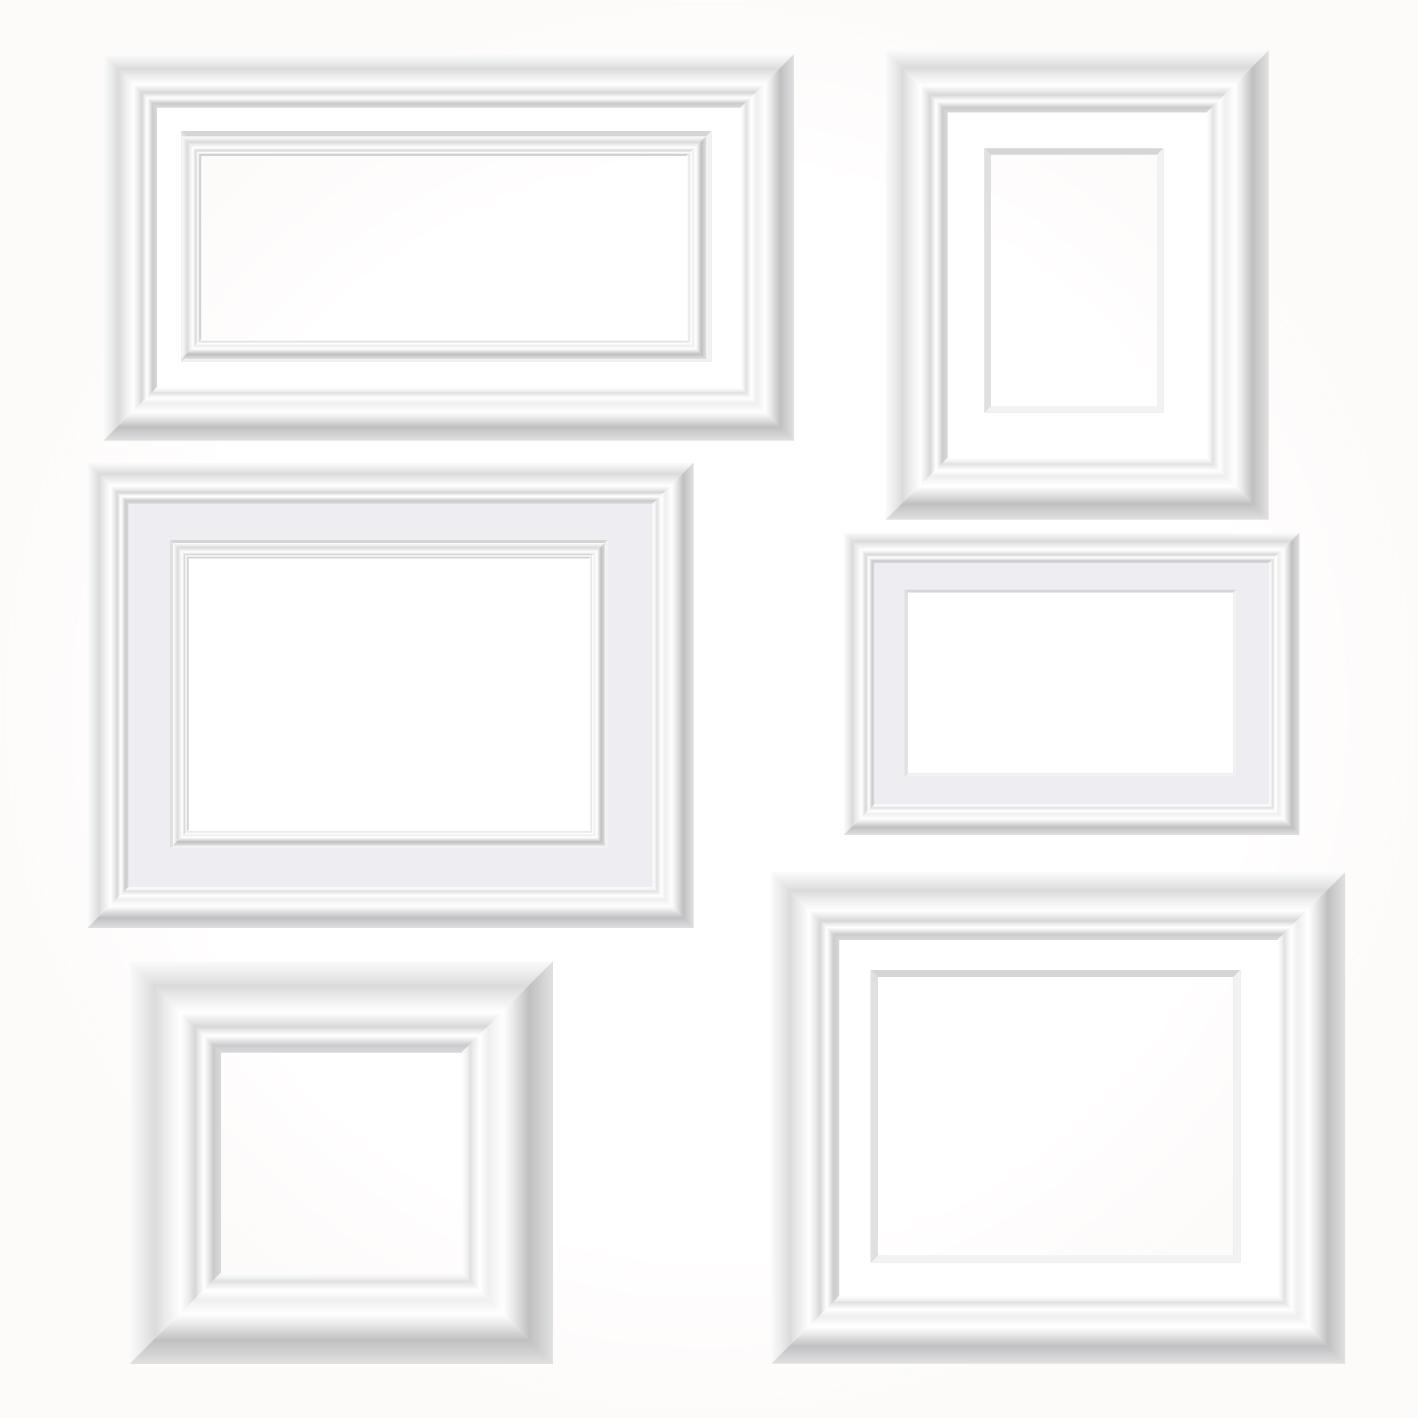 1418x1418 White Photo Frames Vector Set Free Download